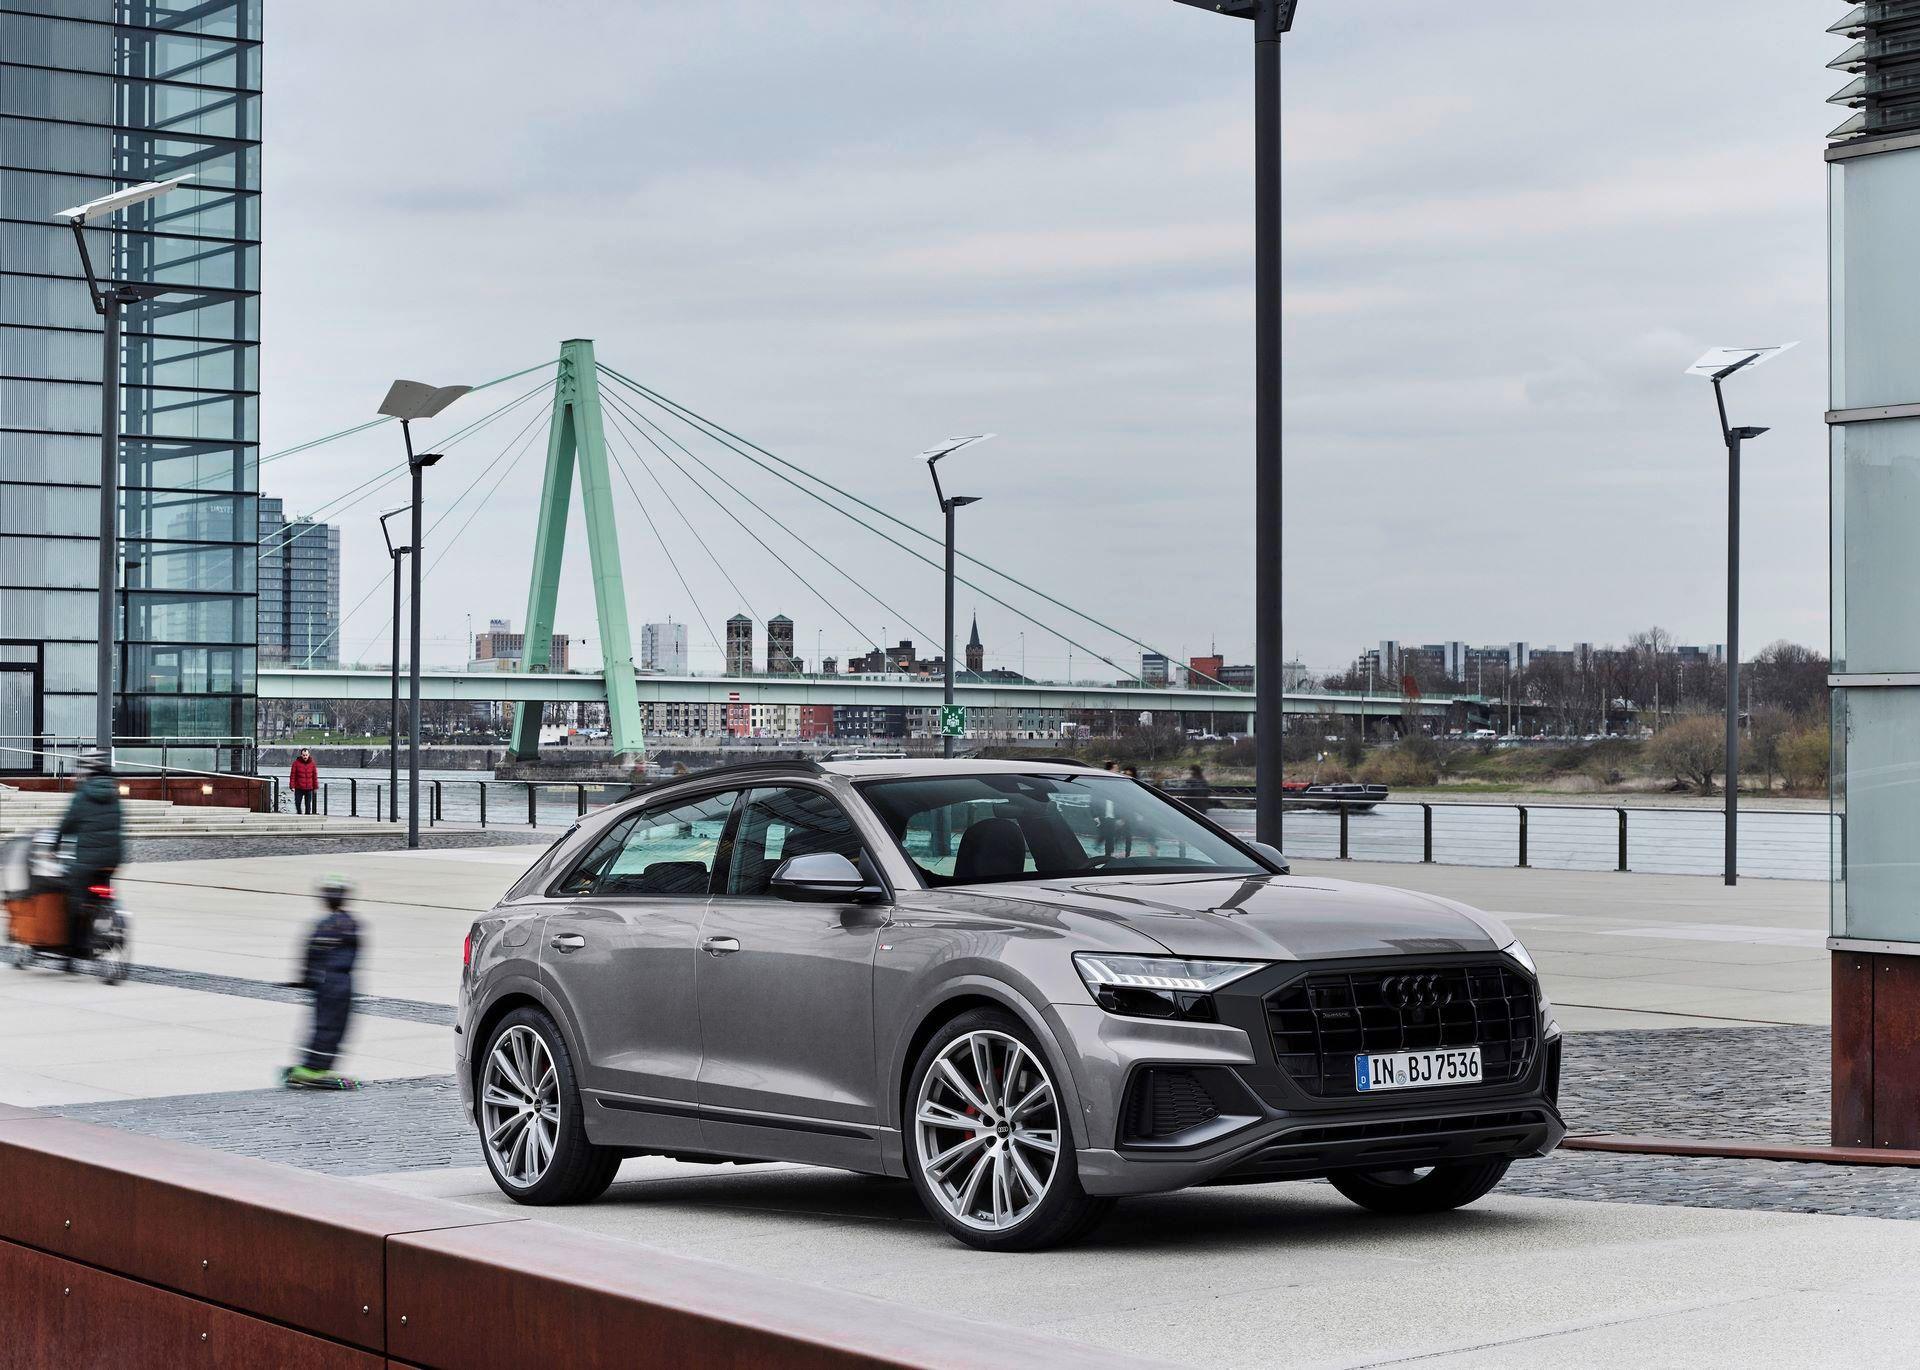 Audi-A4-A5-Q7-Q8-Competition-And-Competition-Plus-Trims-5